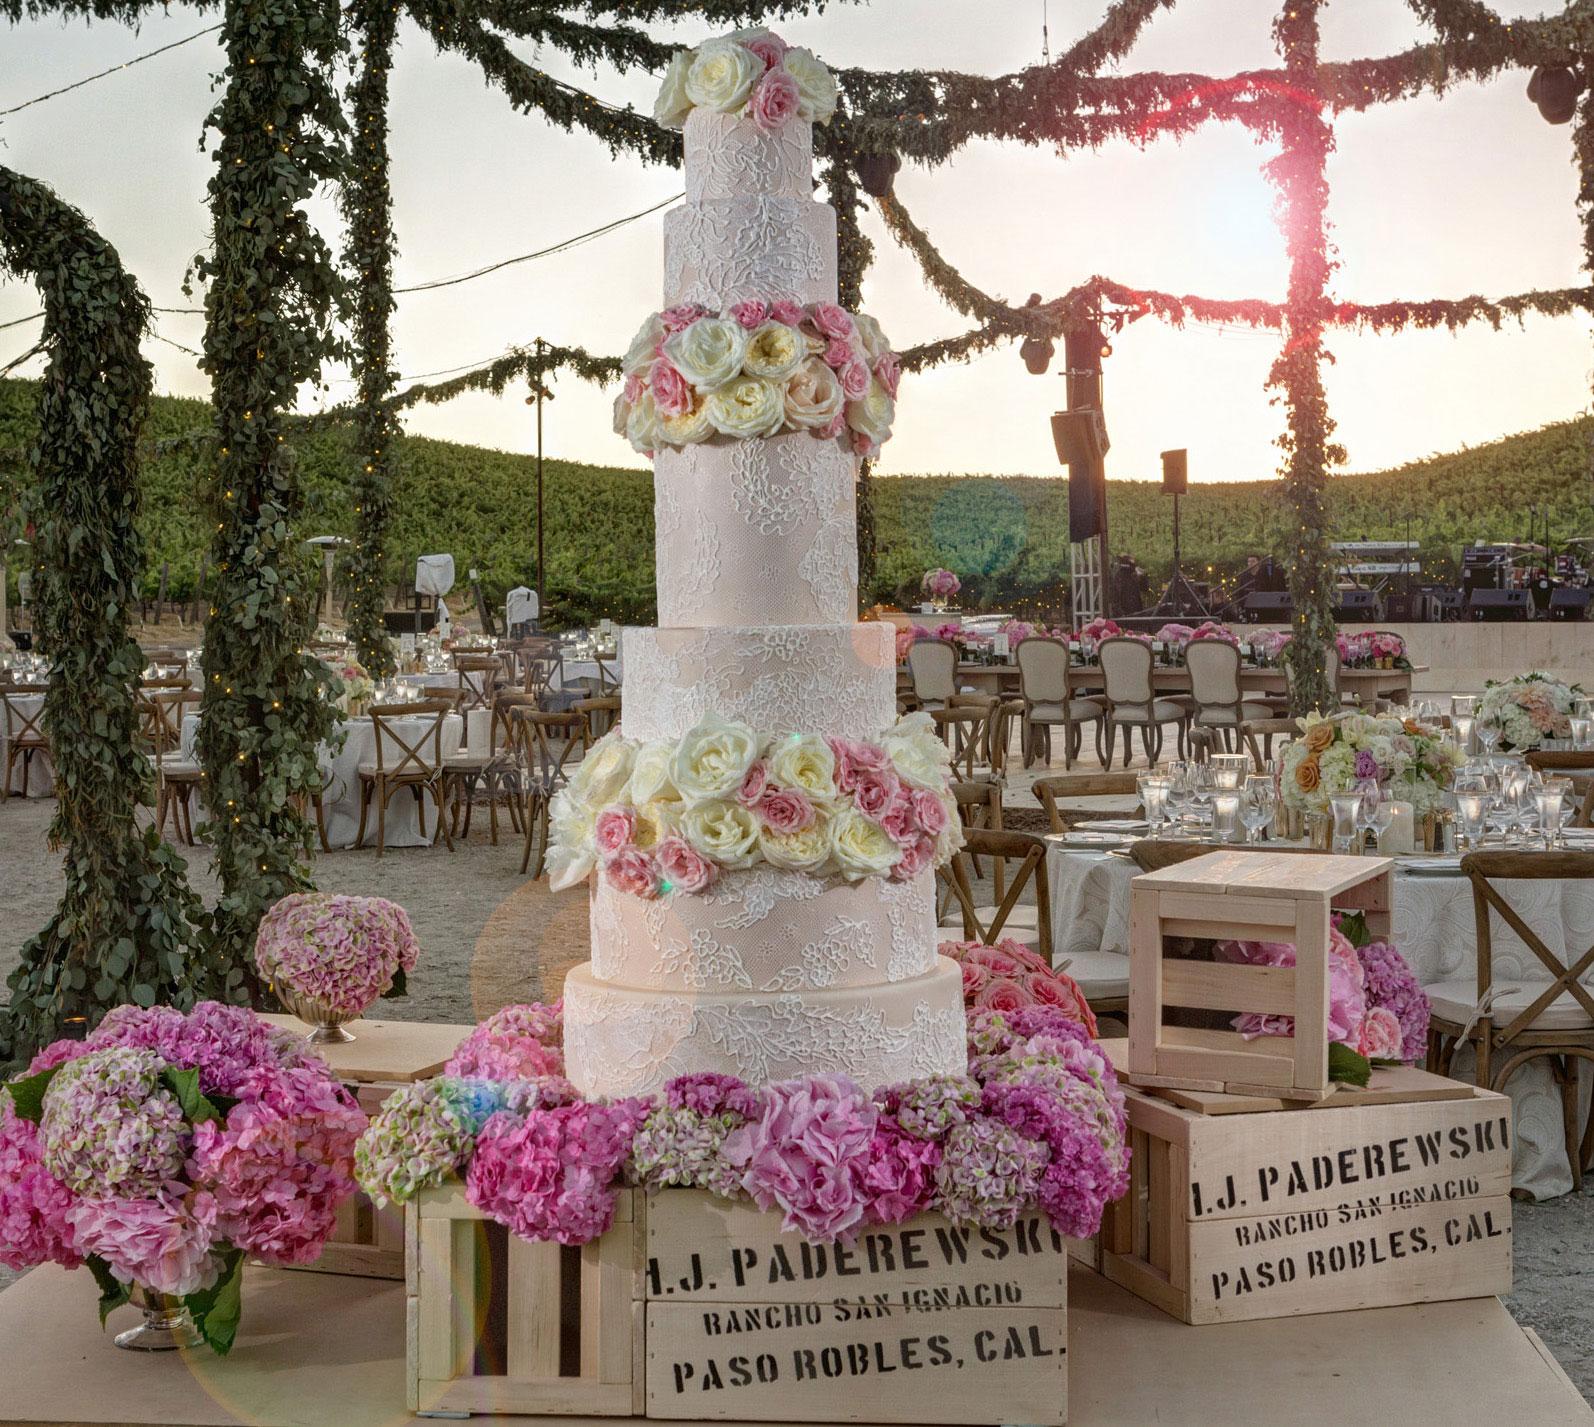 Wedding Cakes 20 Ways To Decorate With Fresh Flowers Inside Weddings